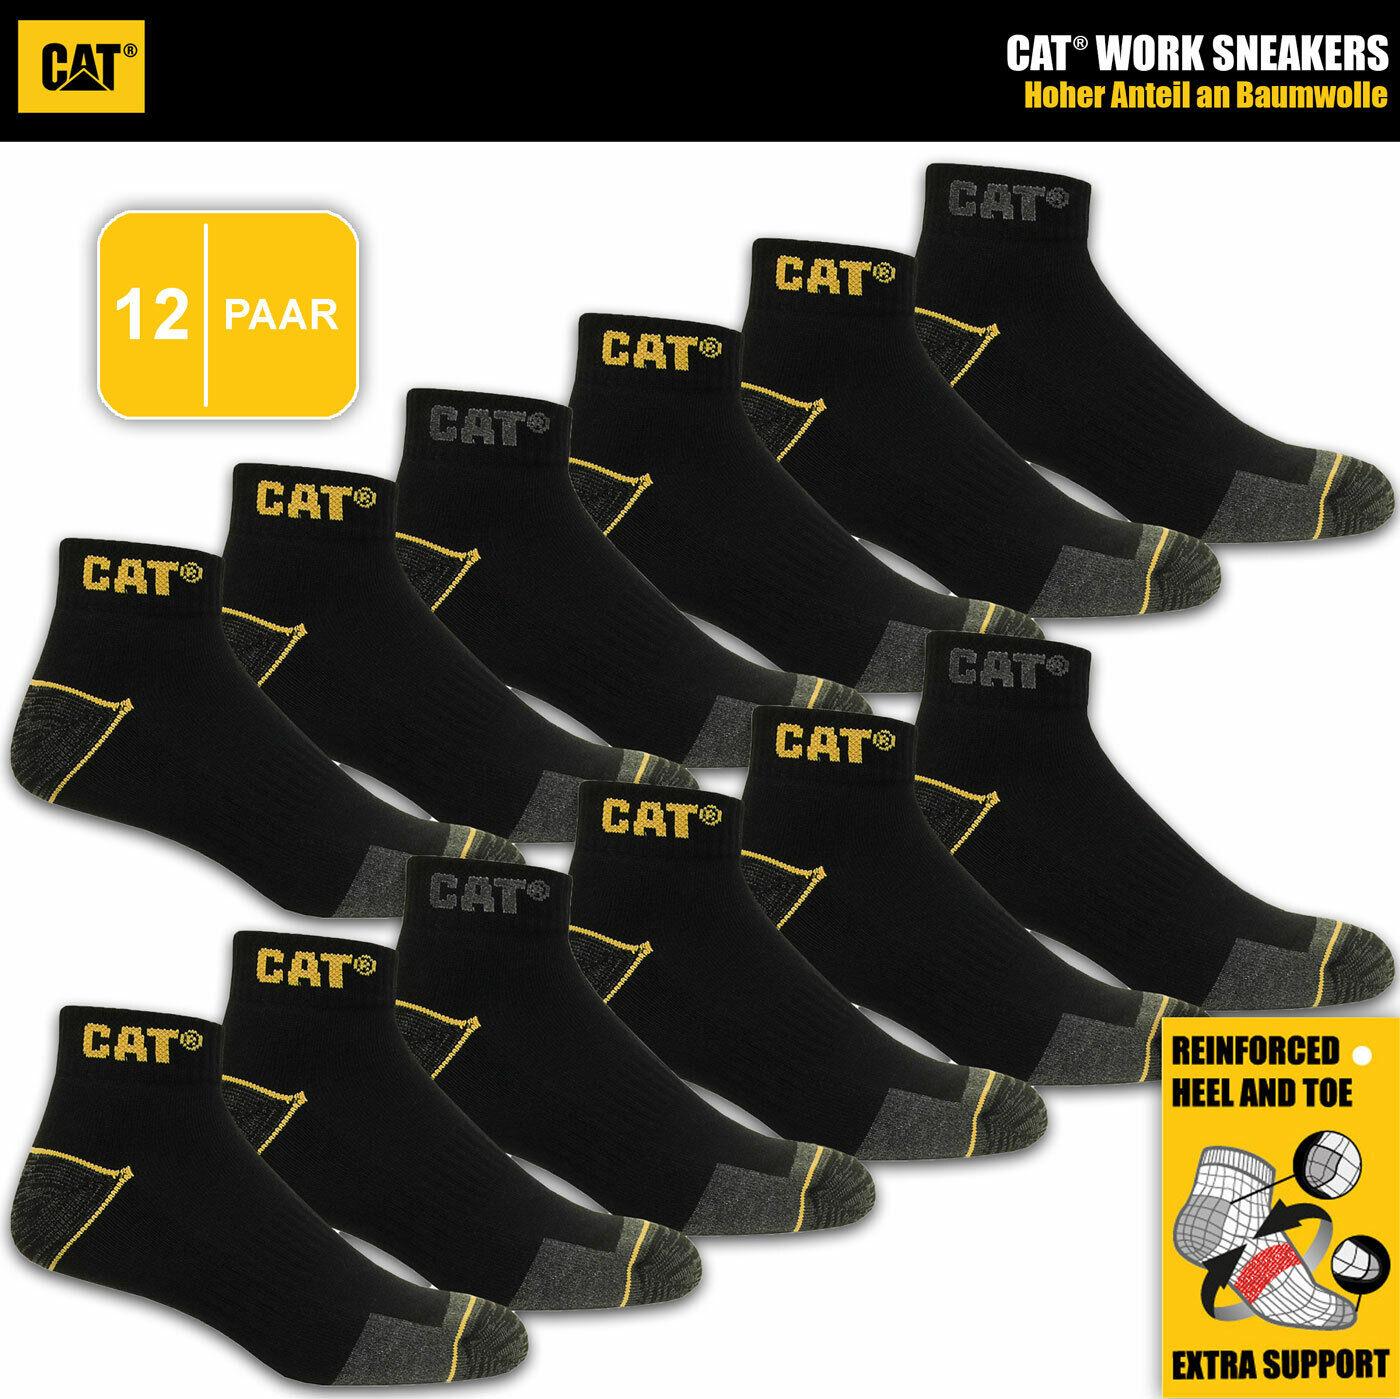 12 Paar CAT® CATERPILLAR WORK SNEAKERS Arbeits Sneaker Socken Strümpfe 🧦 39-46